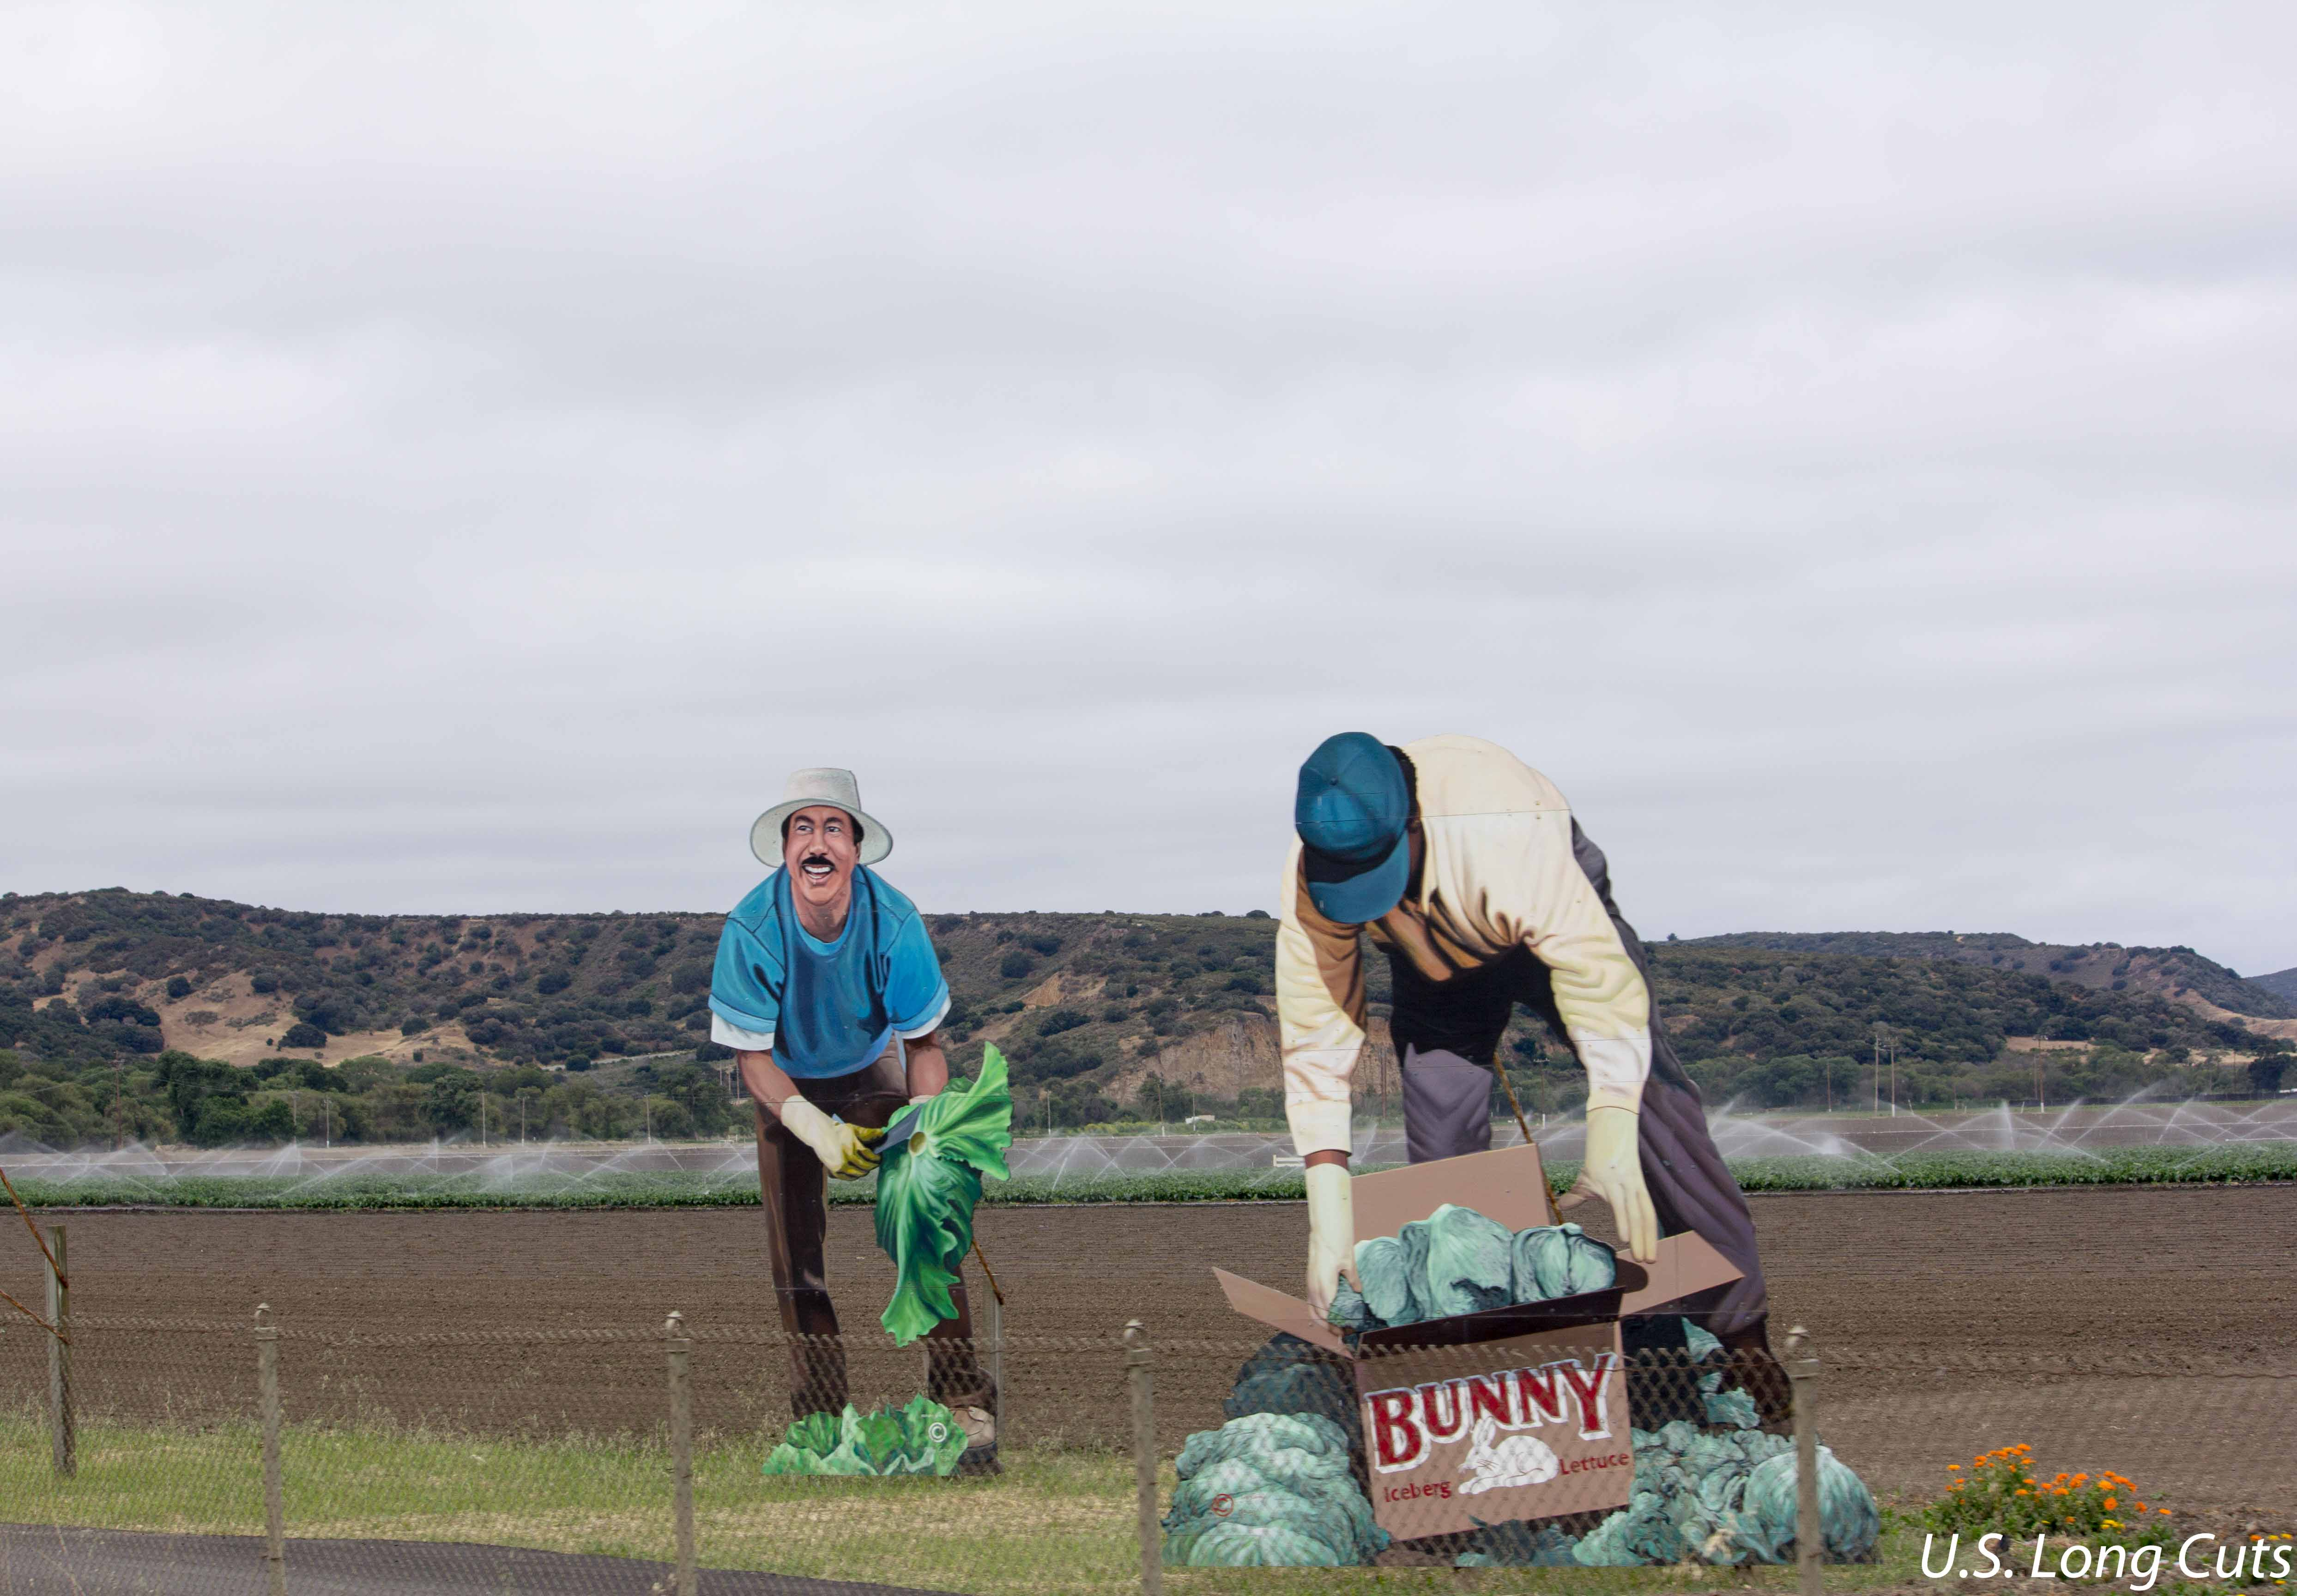 The Farm sculptures